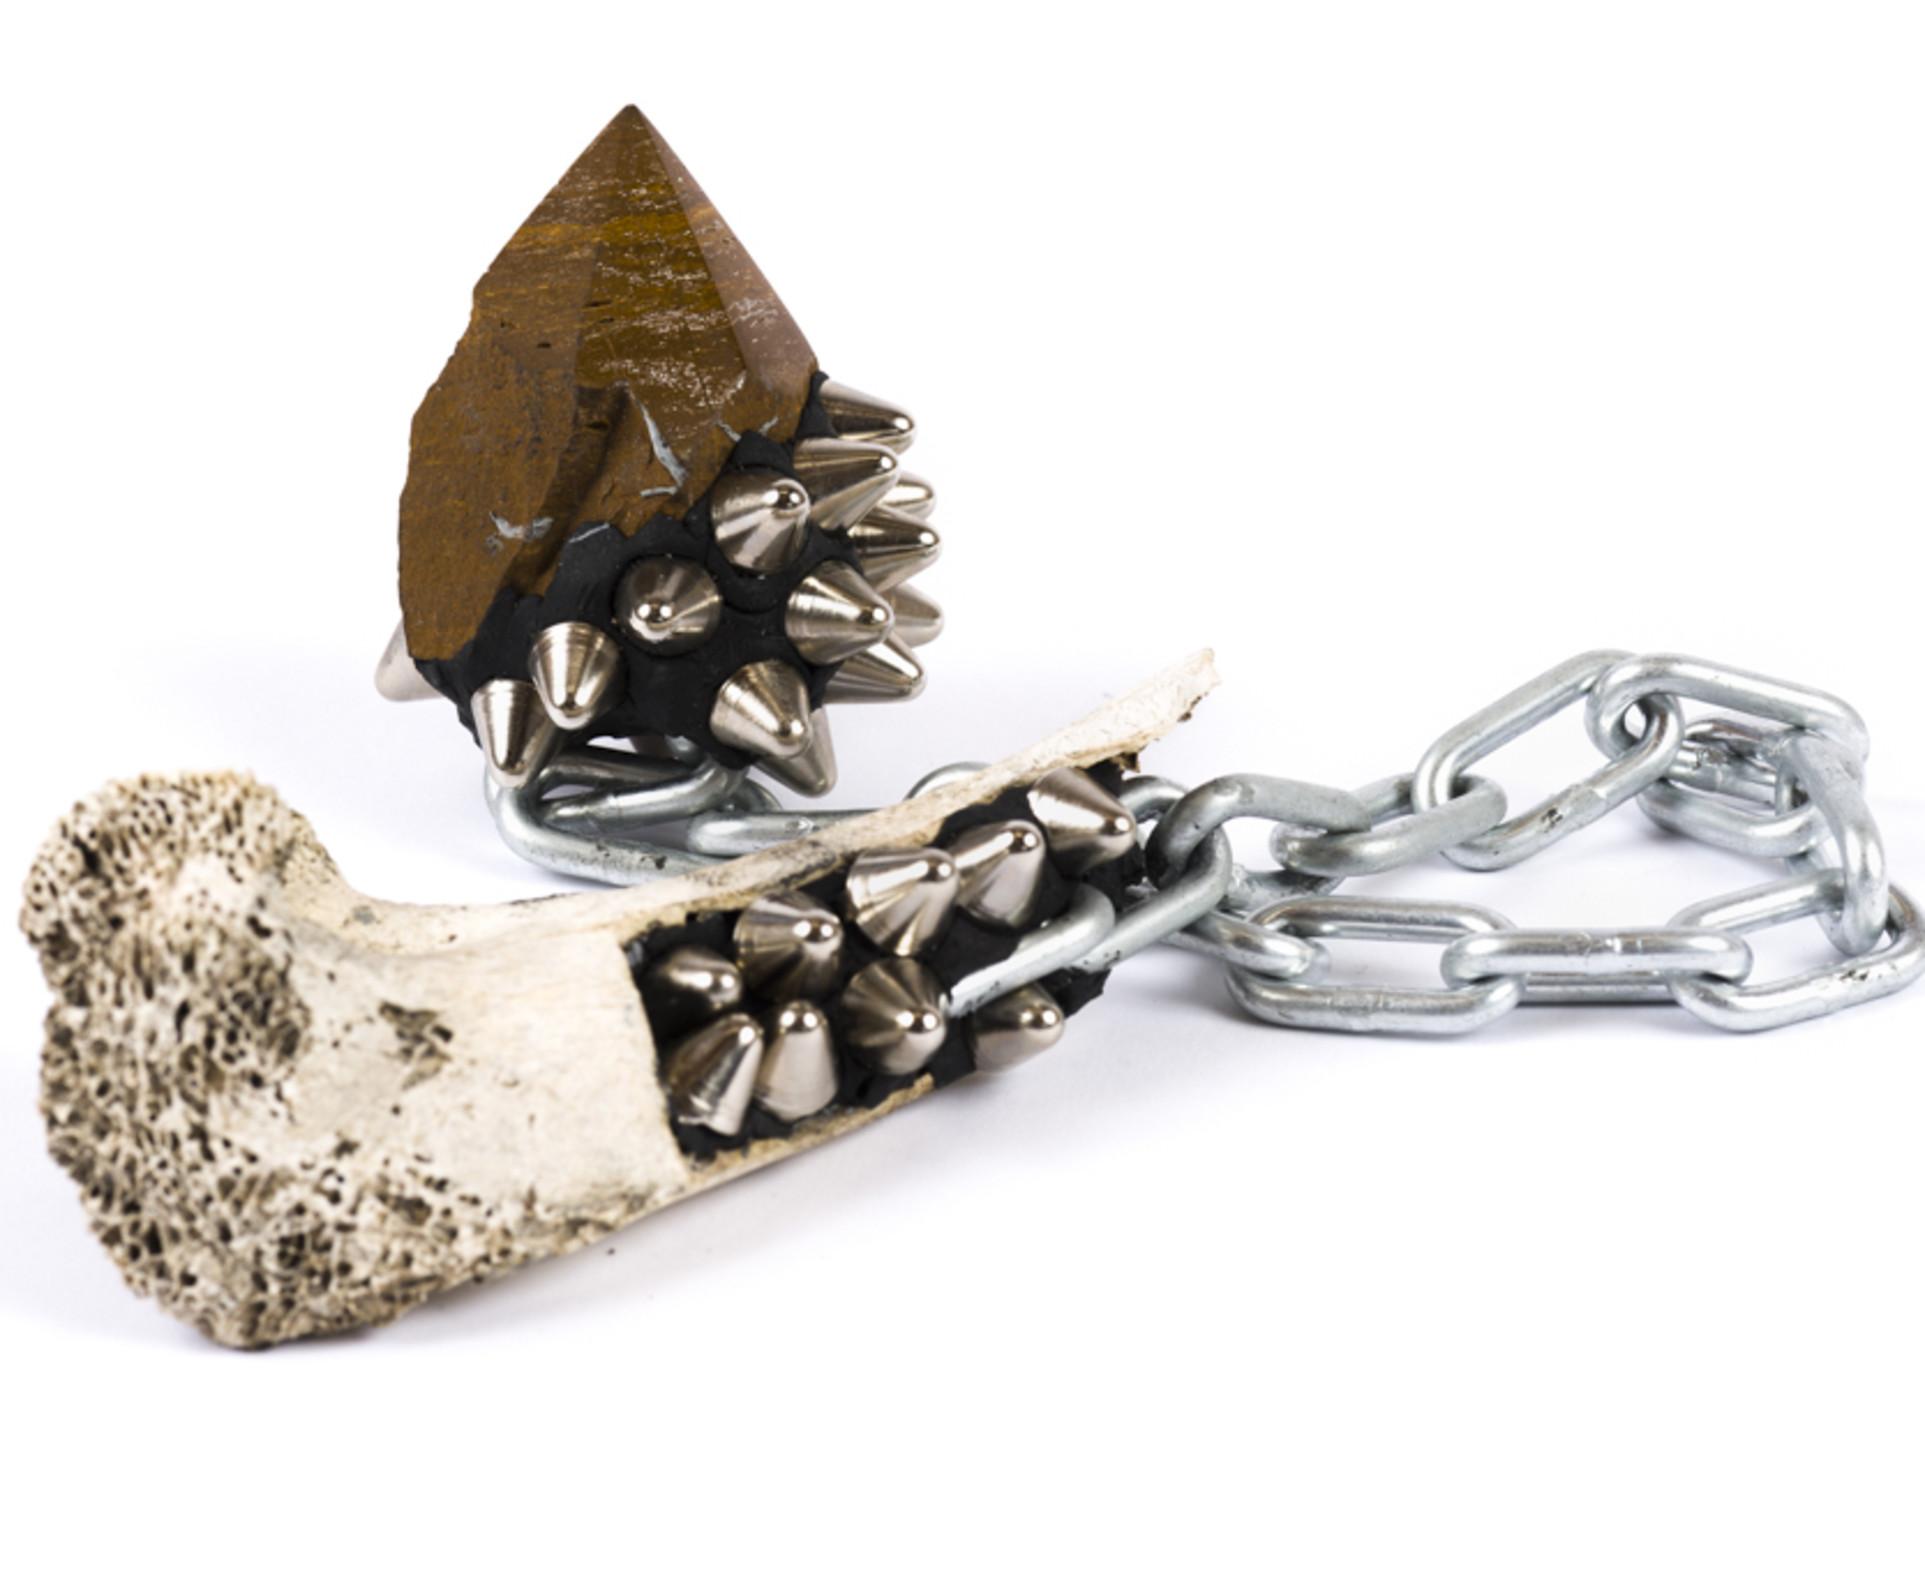 Lucien Shapiro, Jasper with Bone Handle Mace, 2017